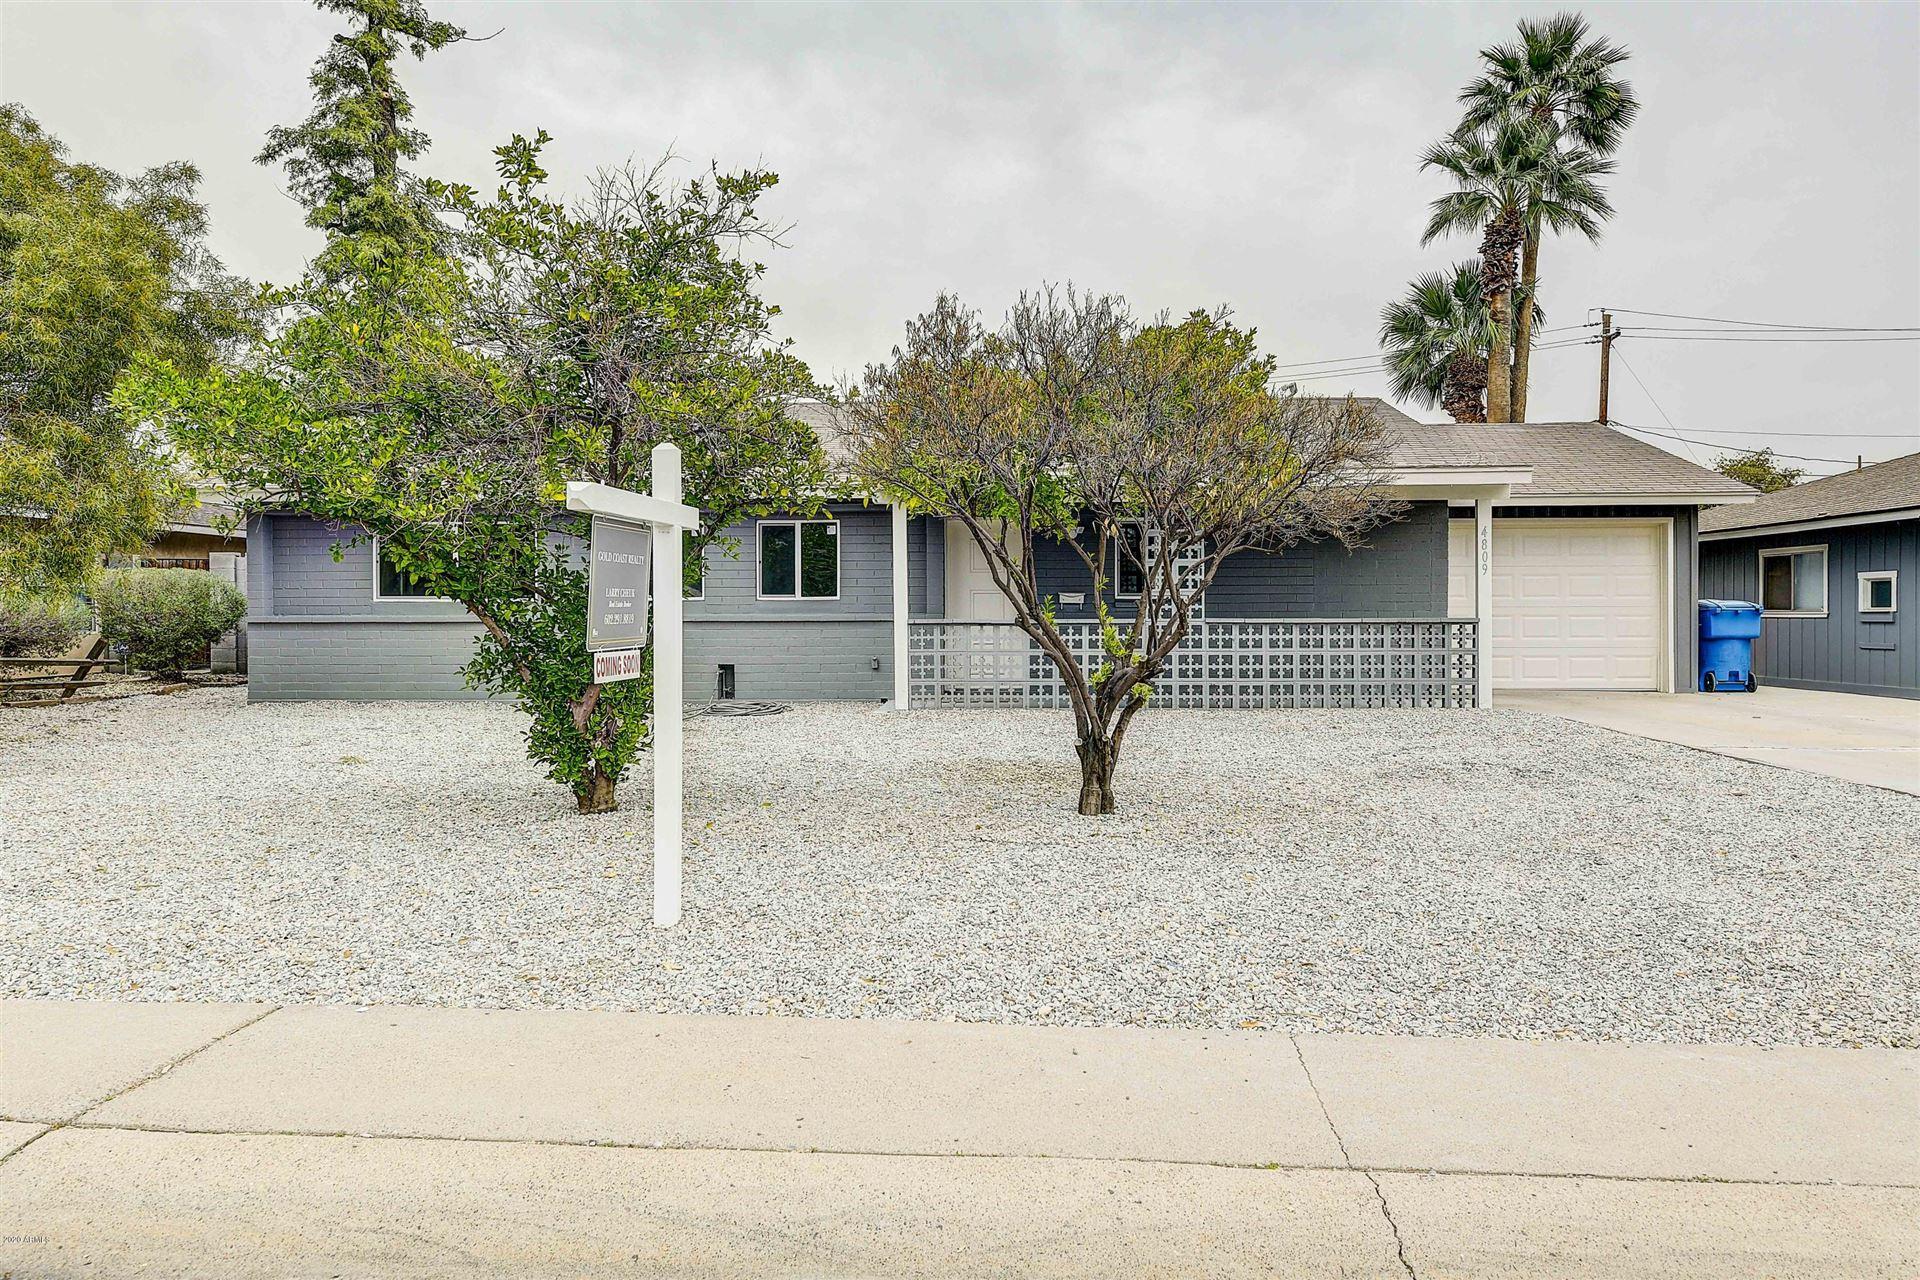 4809 N 31ST Street, Phoenix, AZ 85016 - MLS#: 6026943